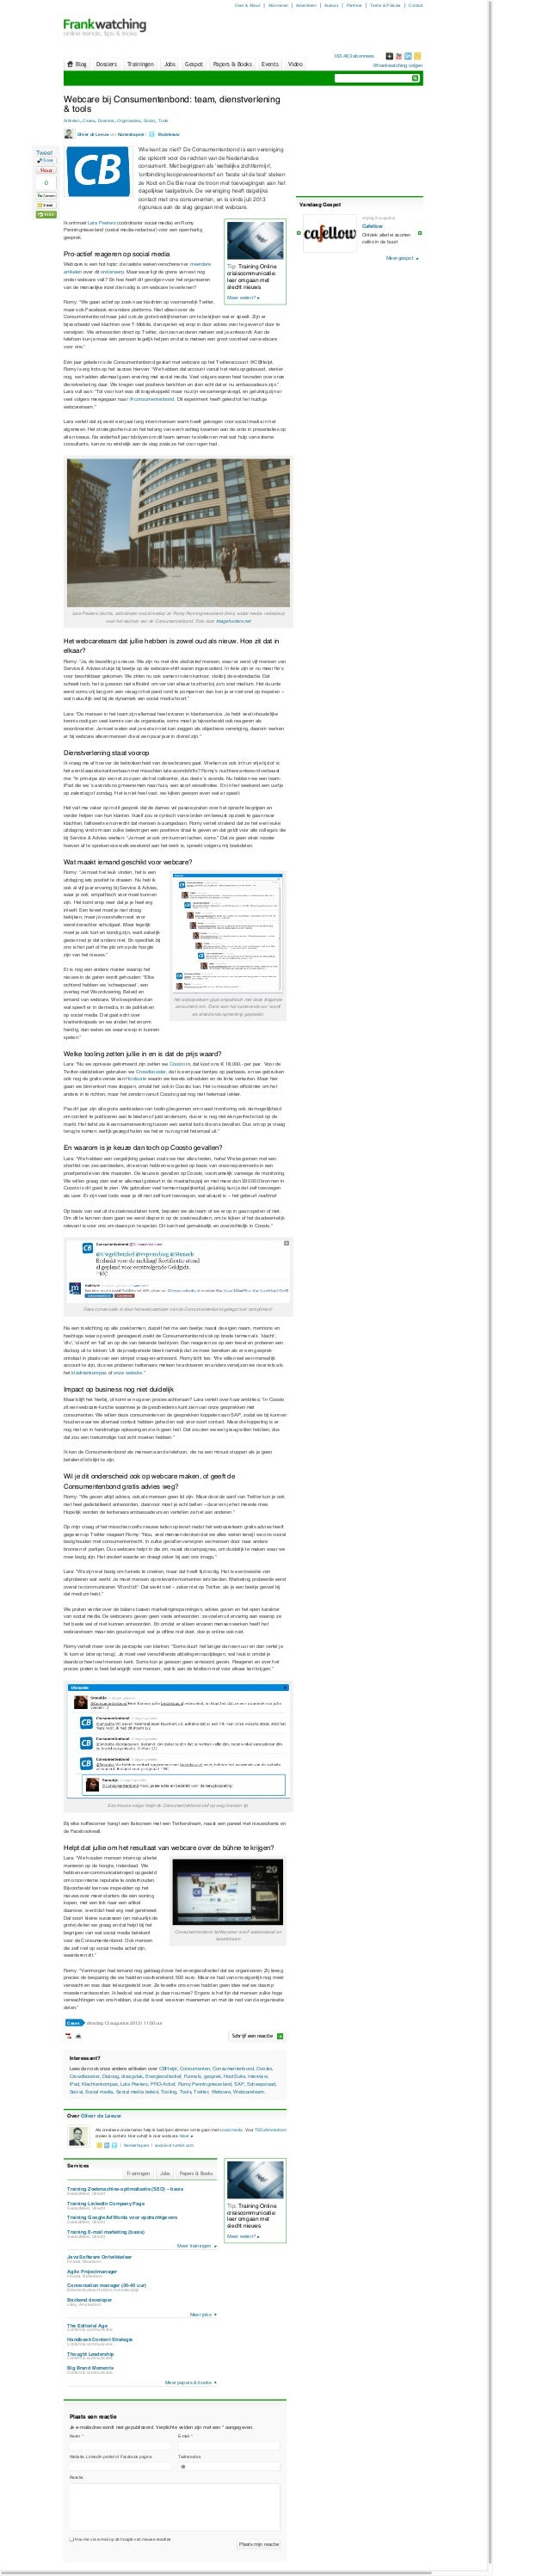 Over & About Abonneren Adverteren Auteurs Partners Terms & Policies Contact 163.483 abonnees @frankwatching volgen Wie ken...